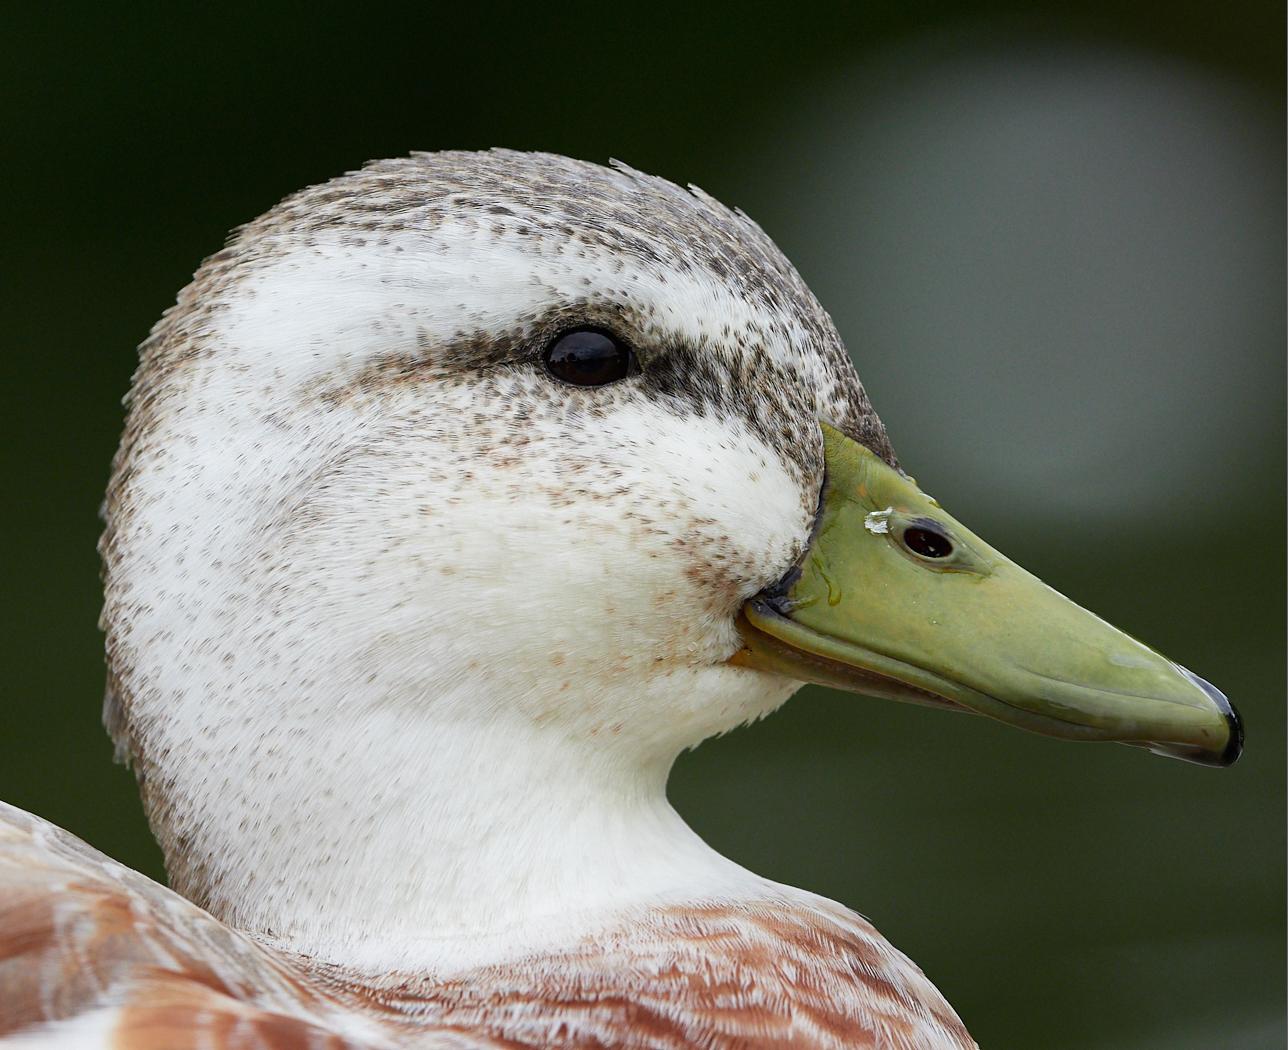 Duck1400x1050 sRGB 10.jpg